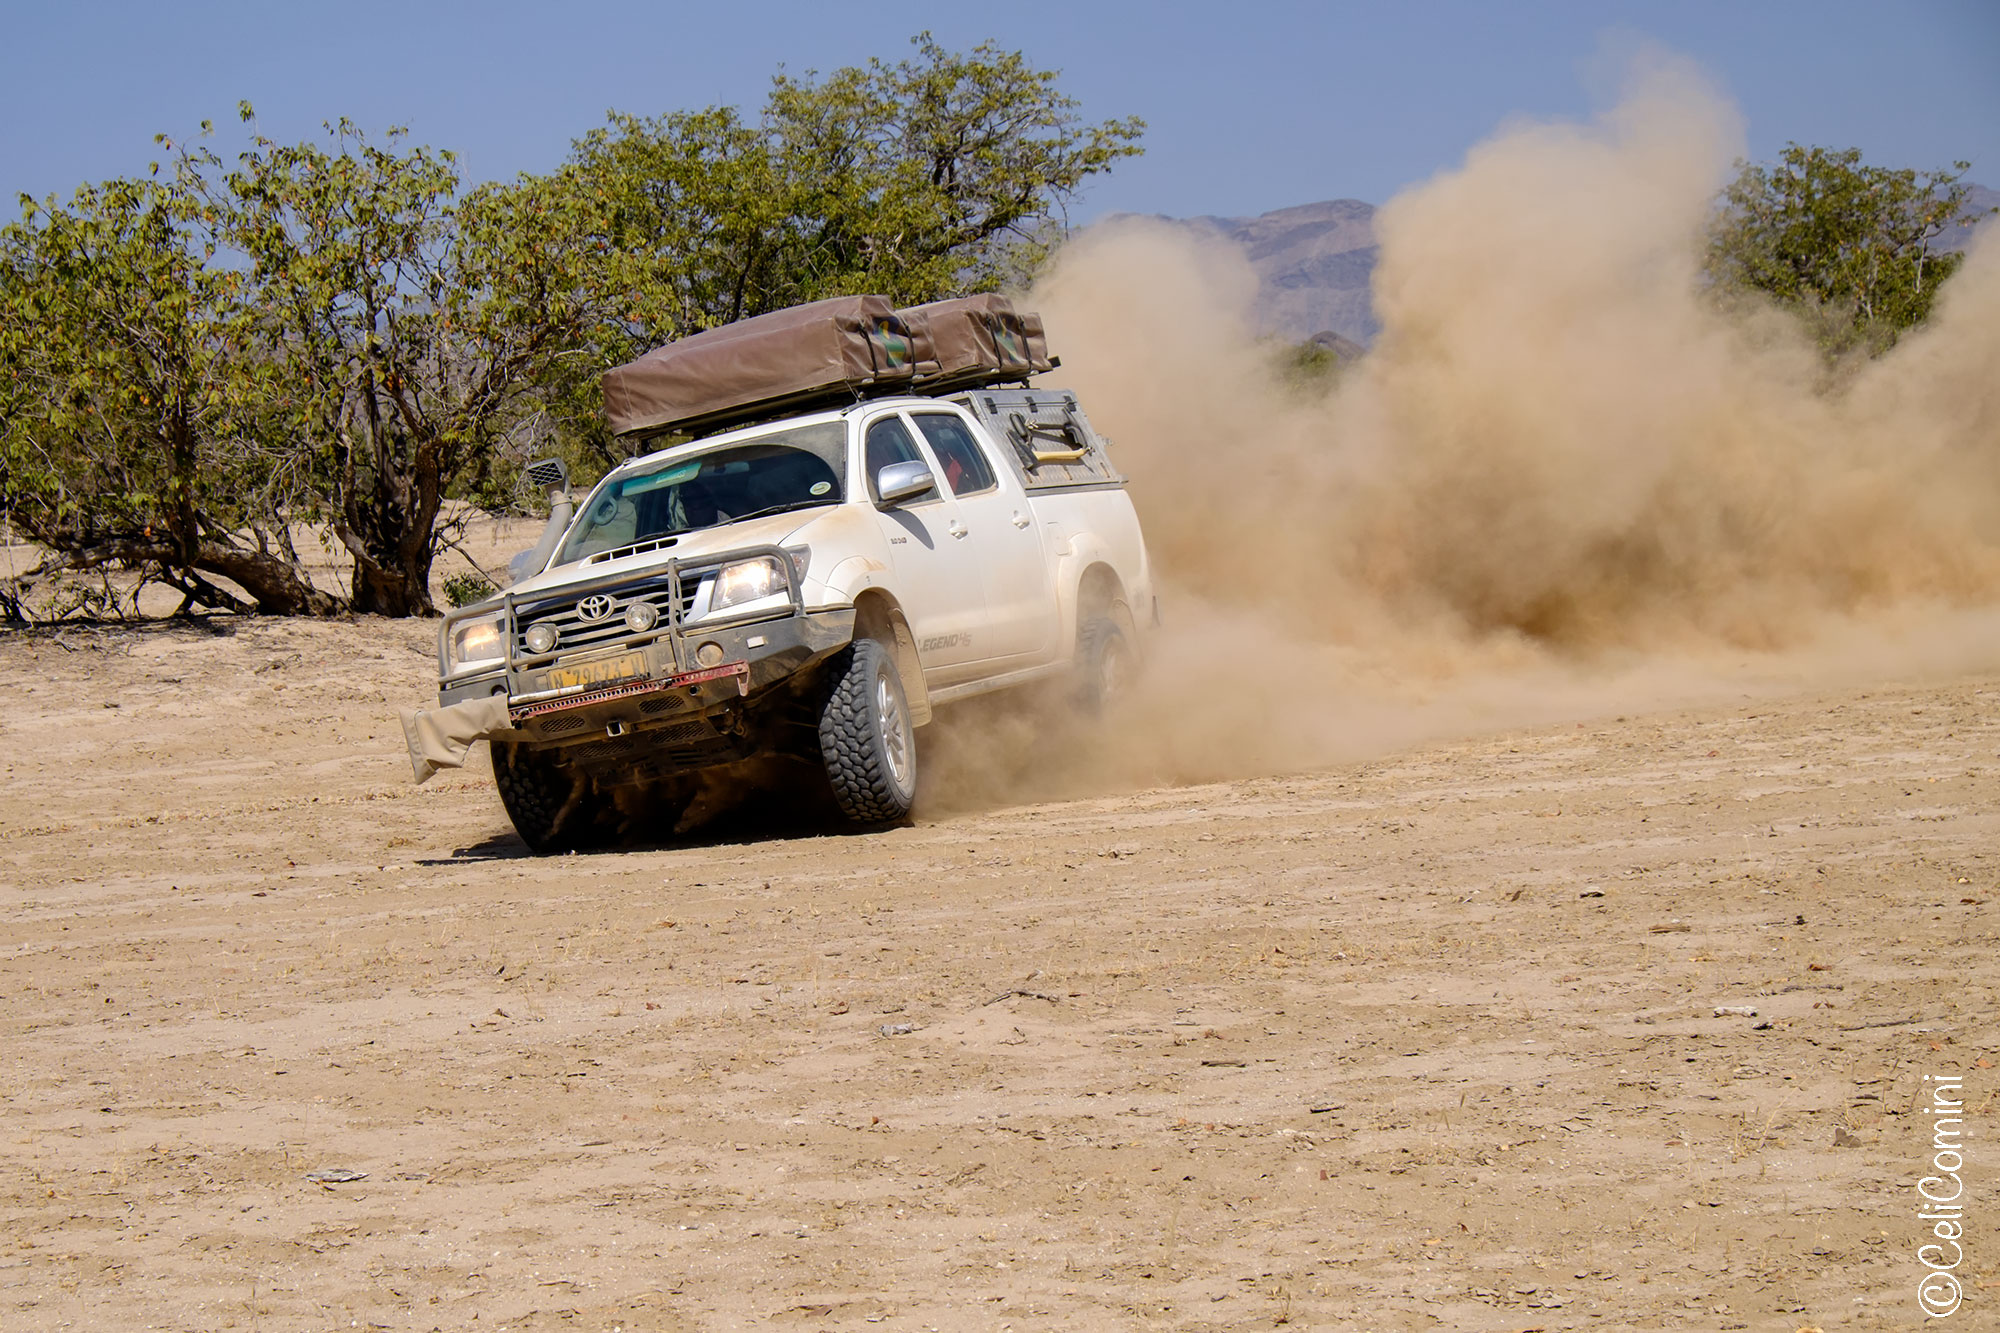 Fes-Fes-Toyota-Hilux-asco